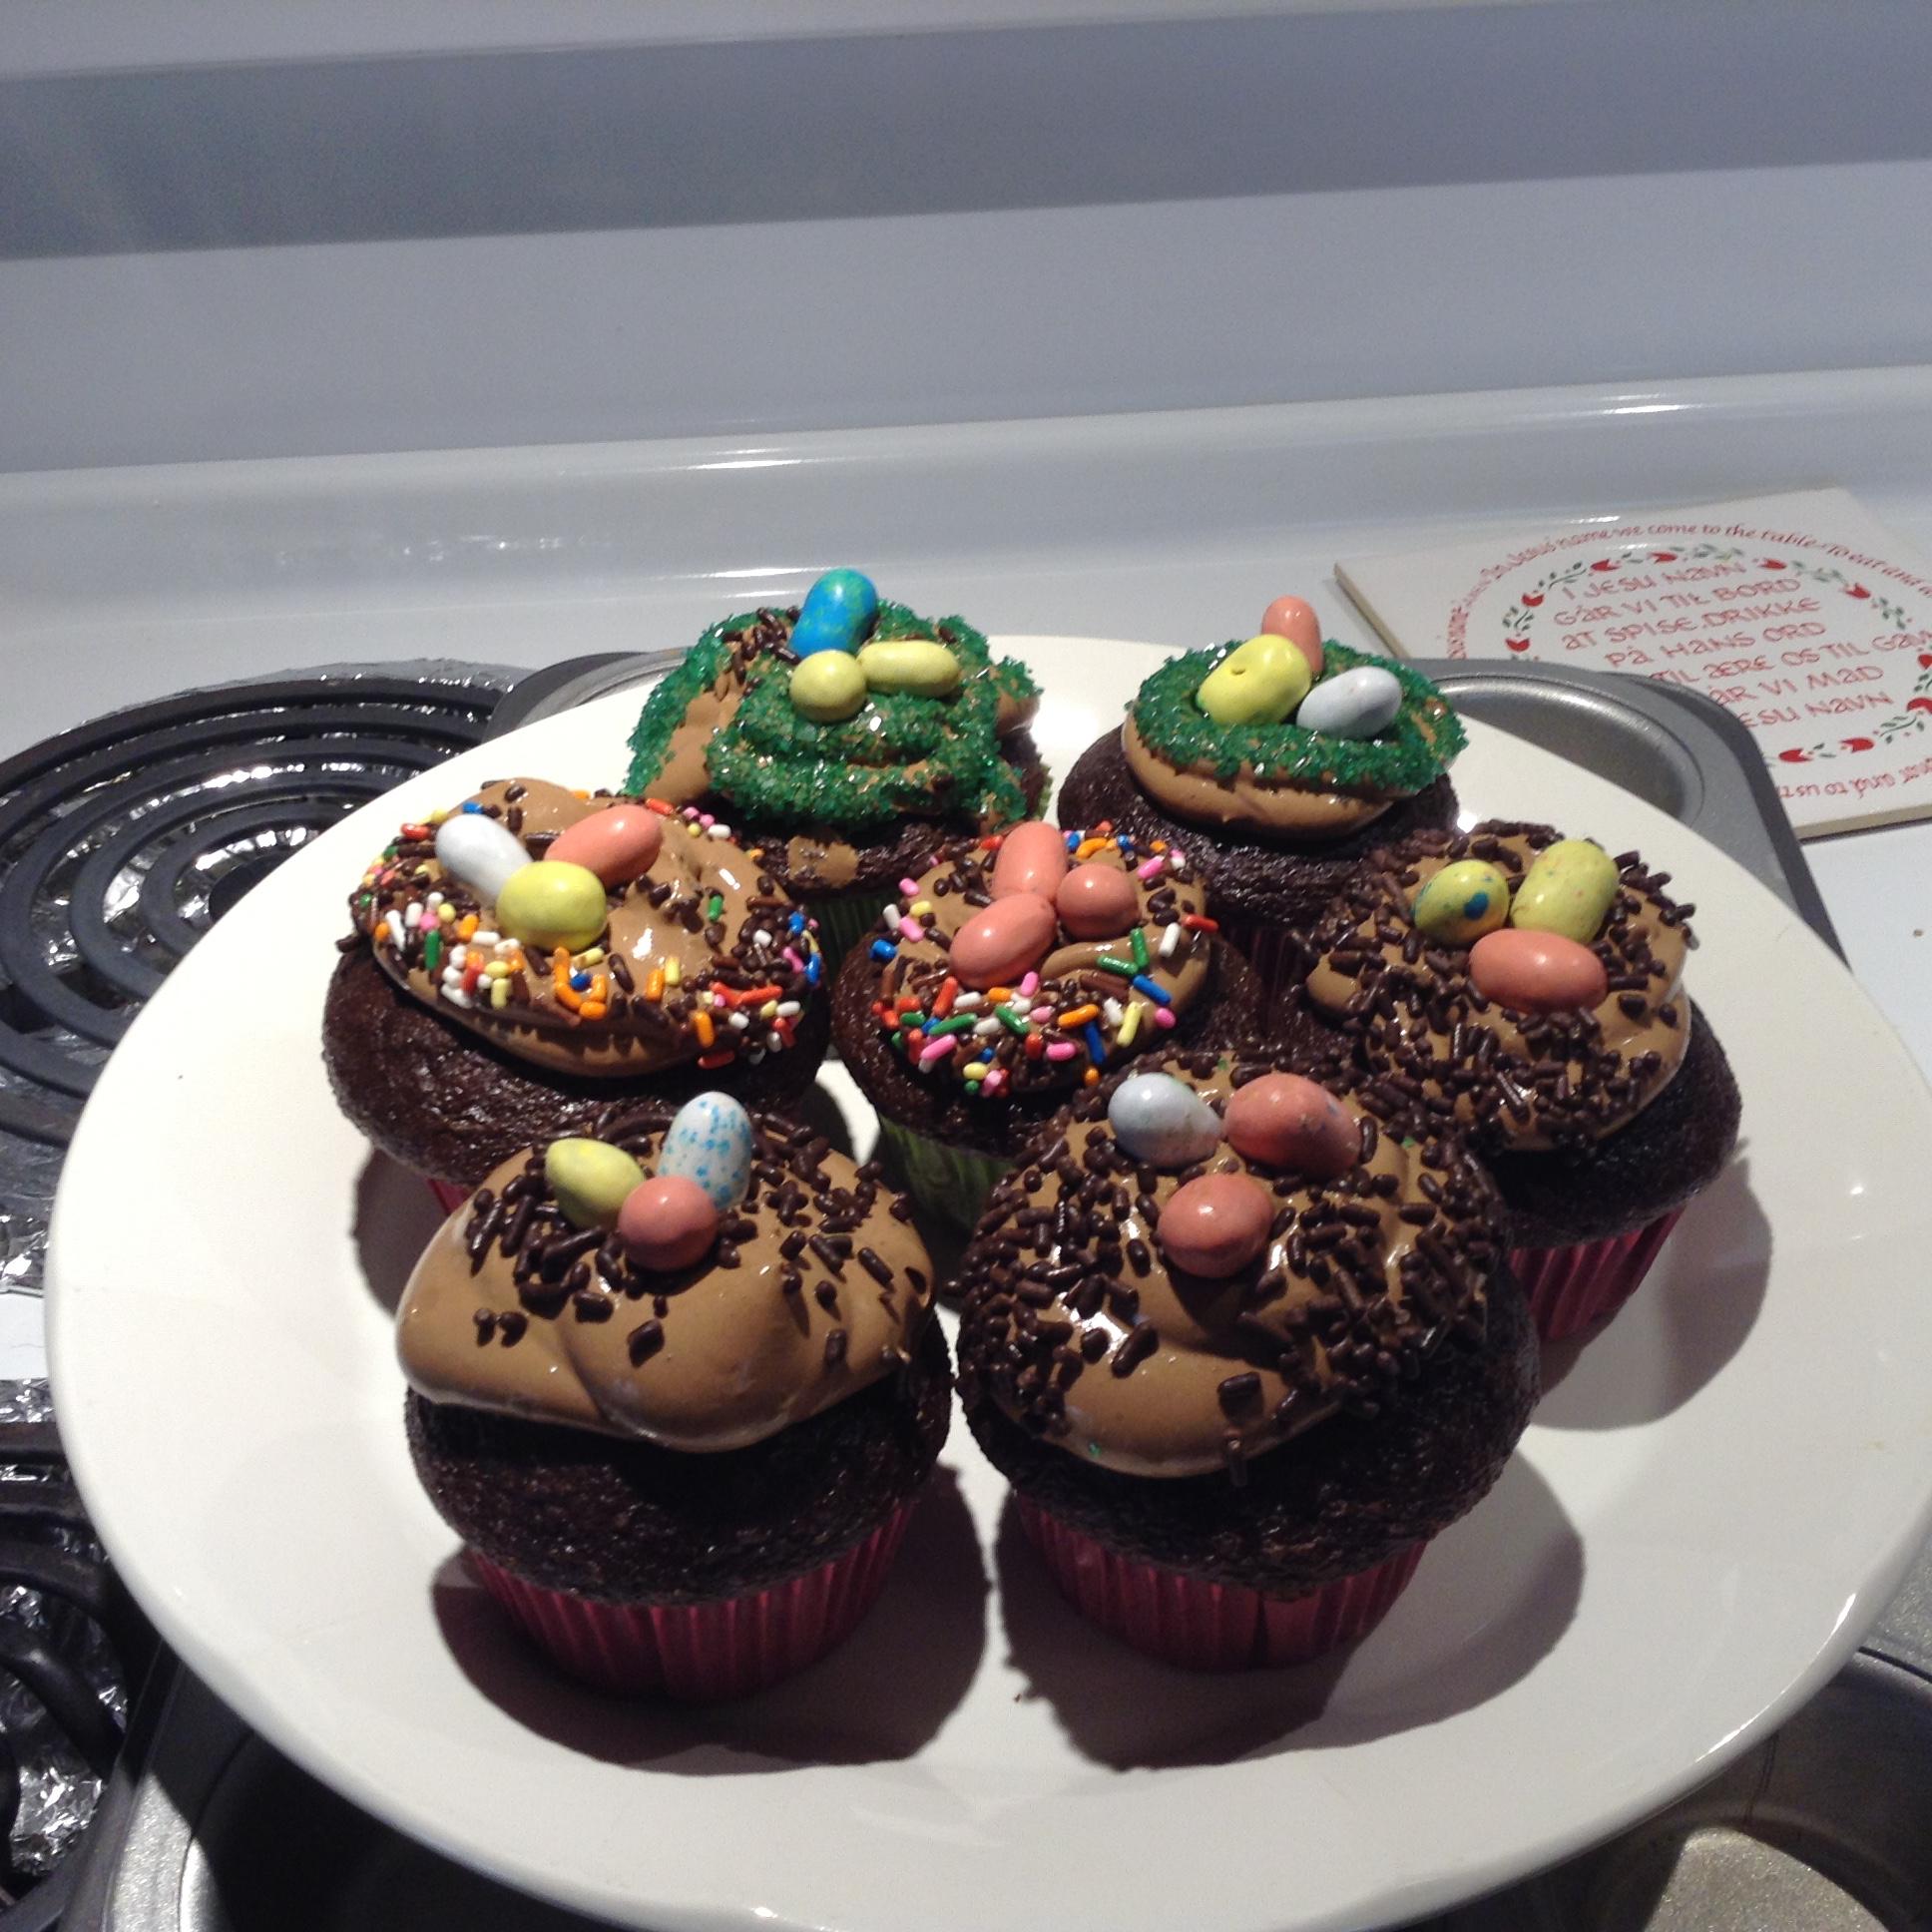 Carlee's Celebrate Spring Cupcakes brittnic99